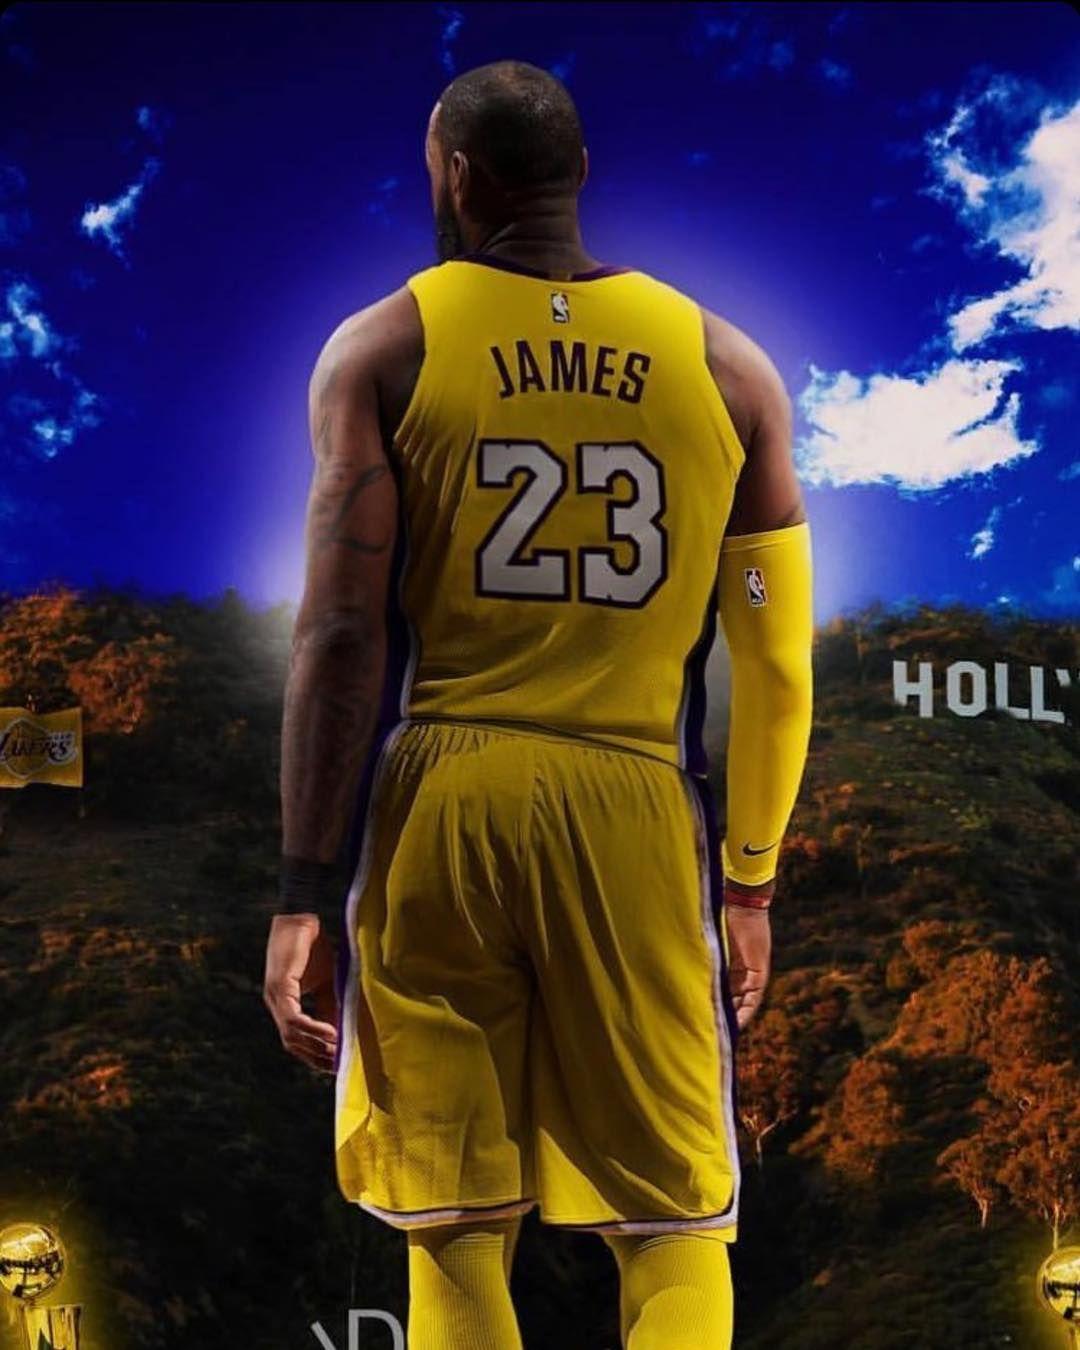 c4afd6416b3 King of LA. King of LA King Lebron James, Lebron James Lakers ...